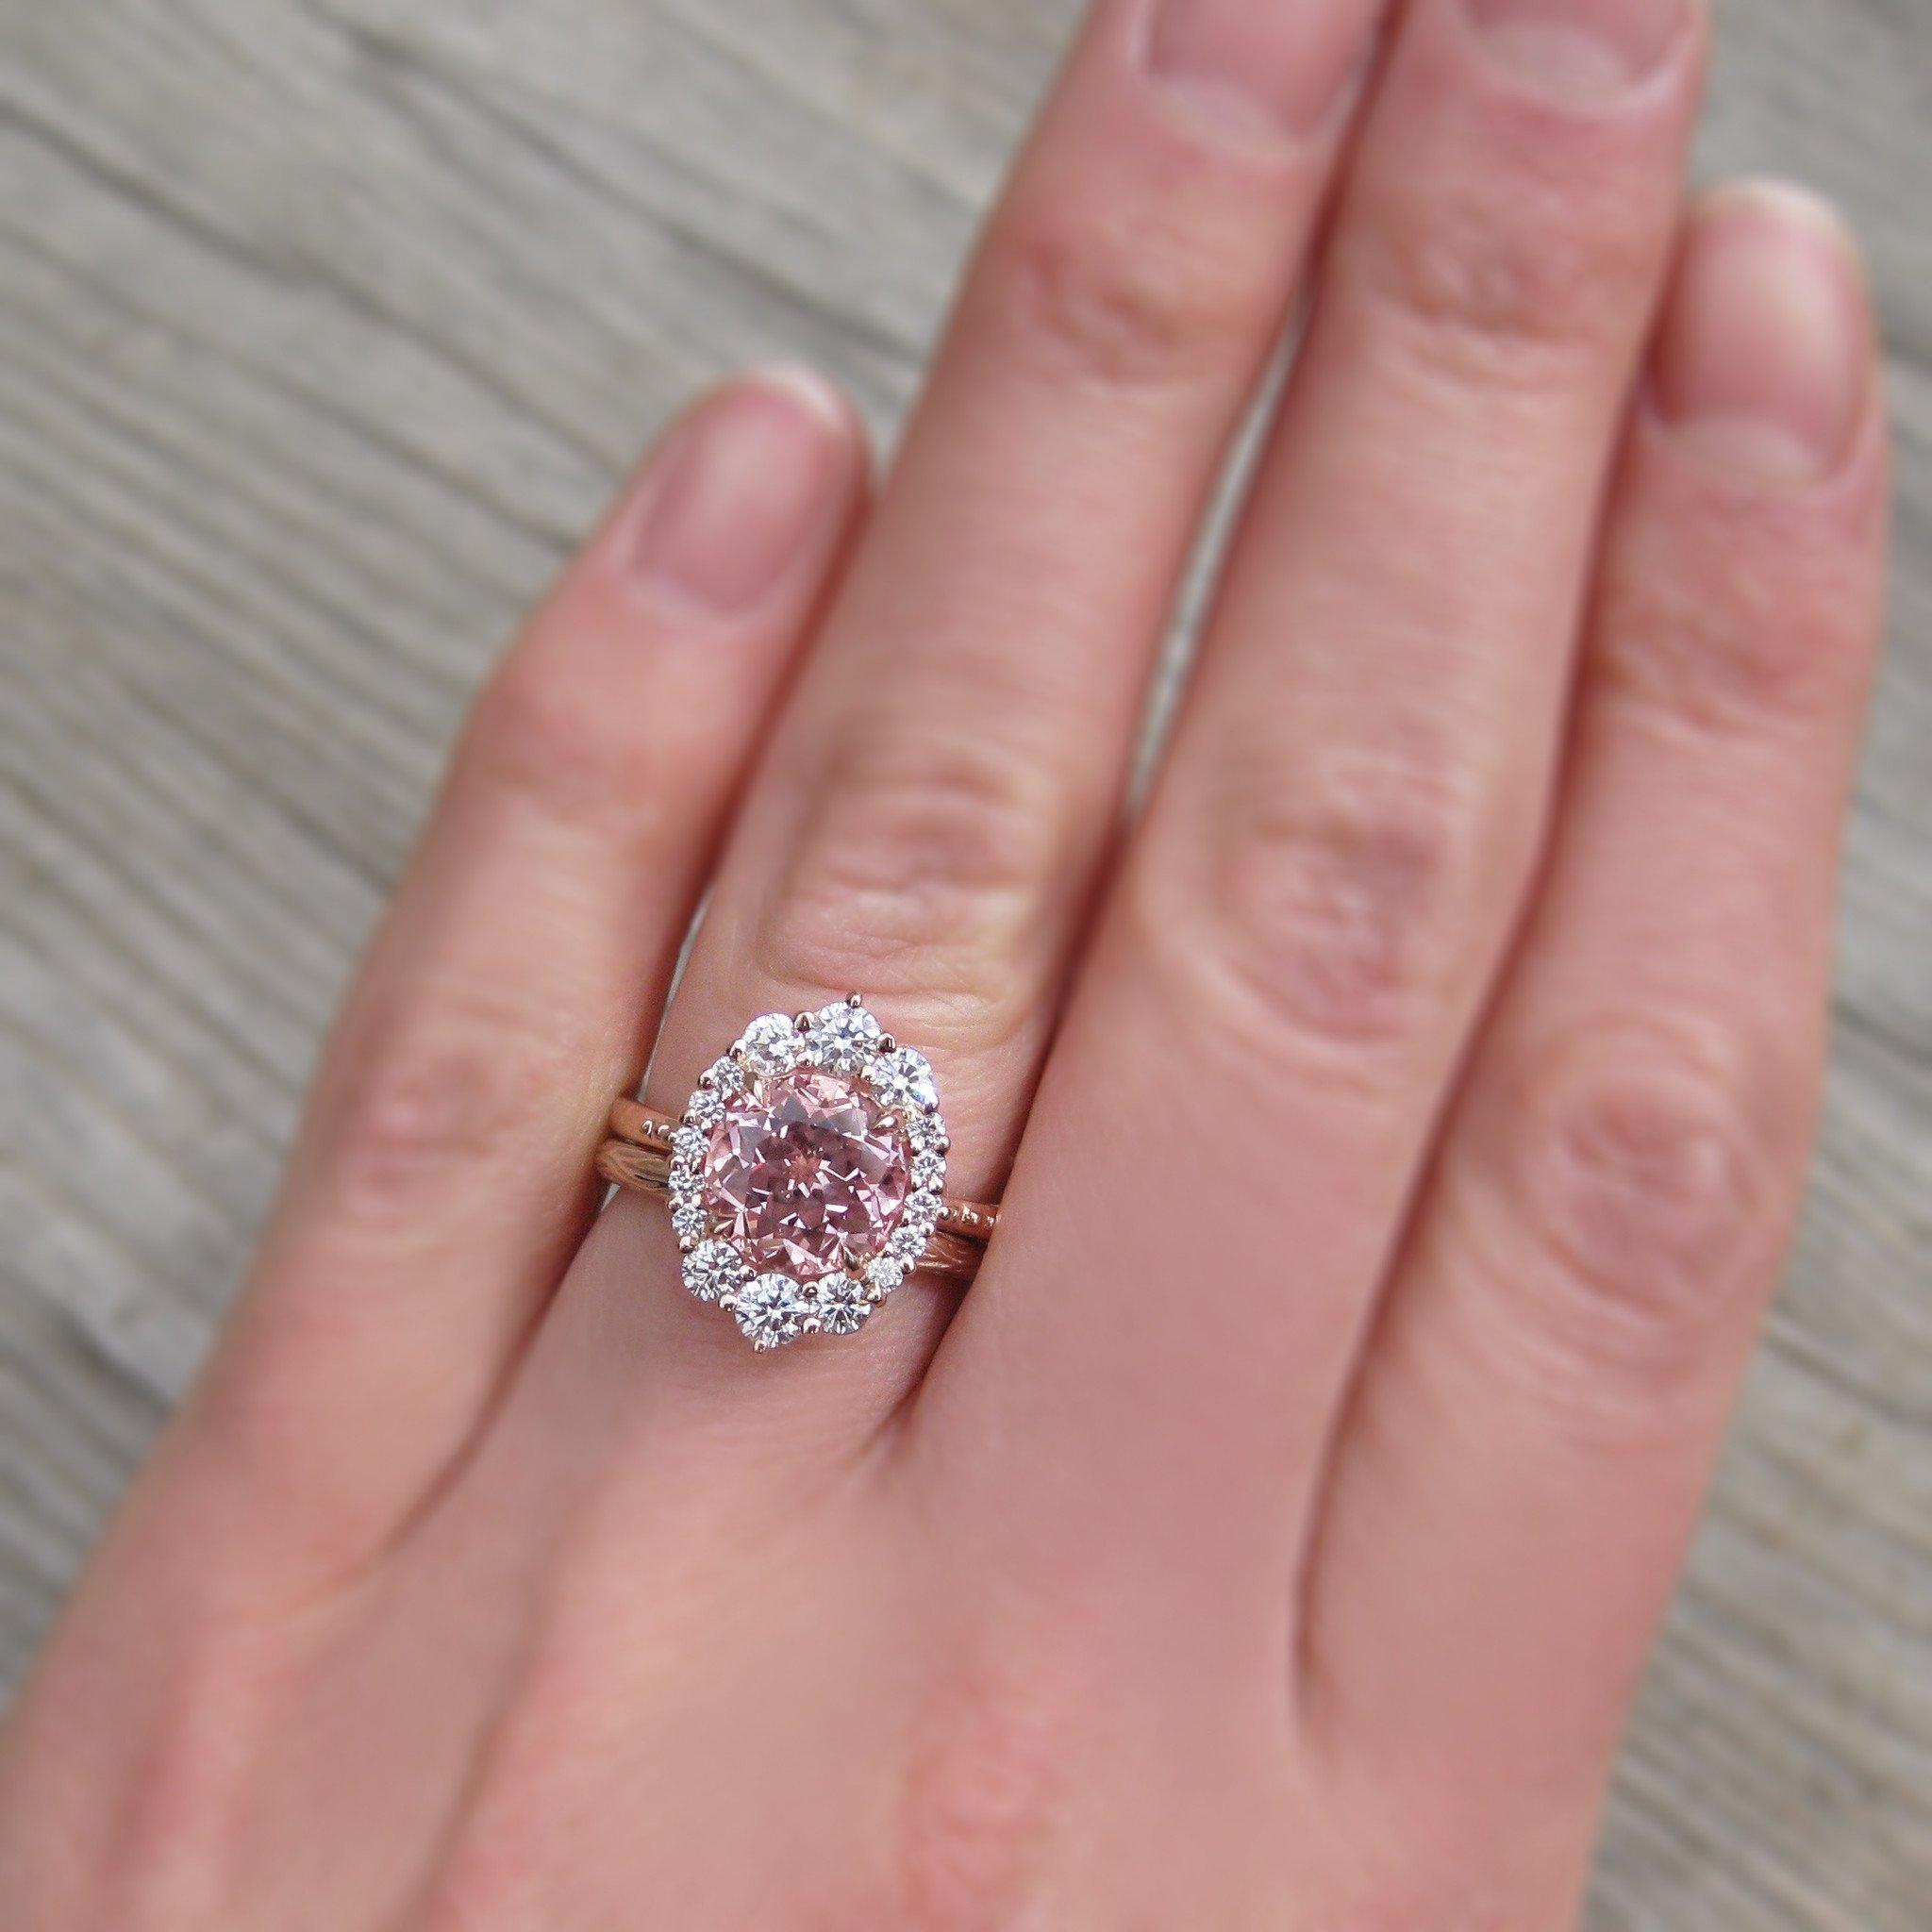 Peach Sapphire Engagement Ring Engagement Rings Sapphire Peach